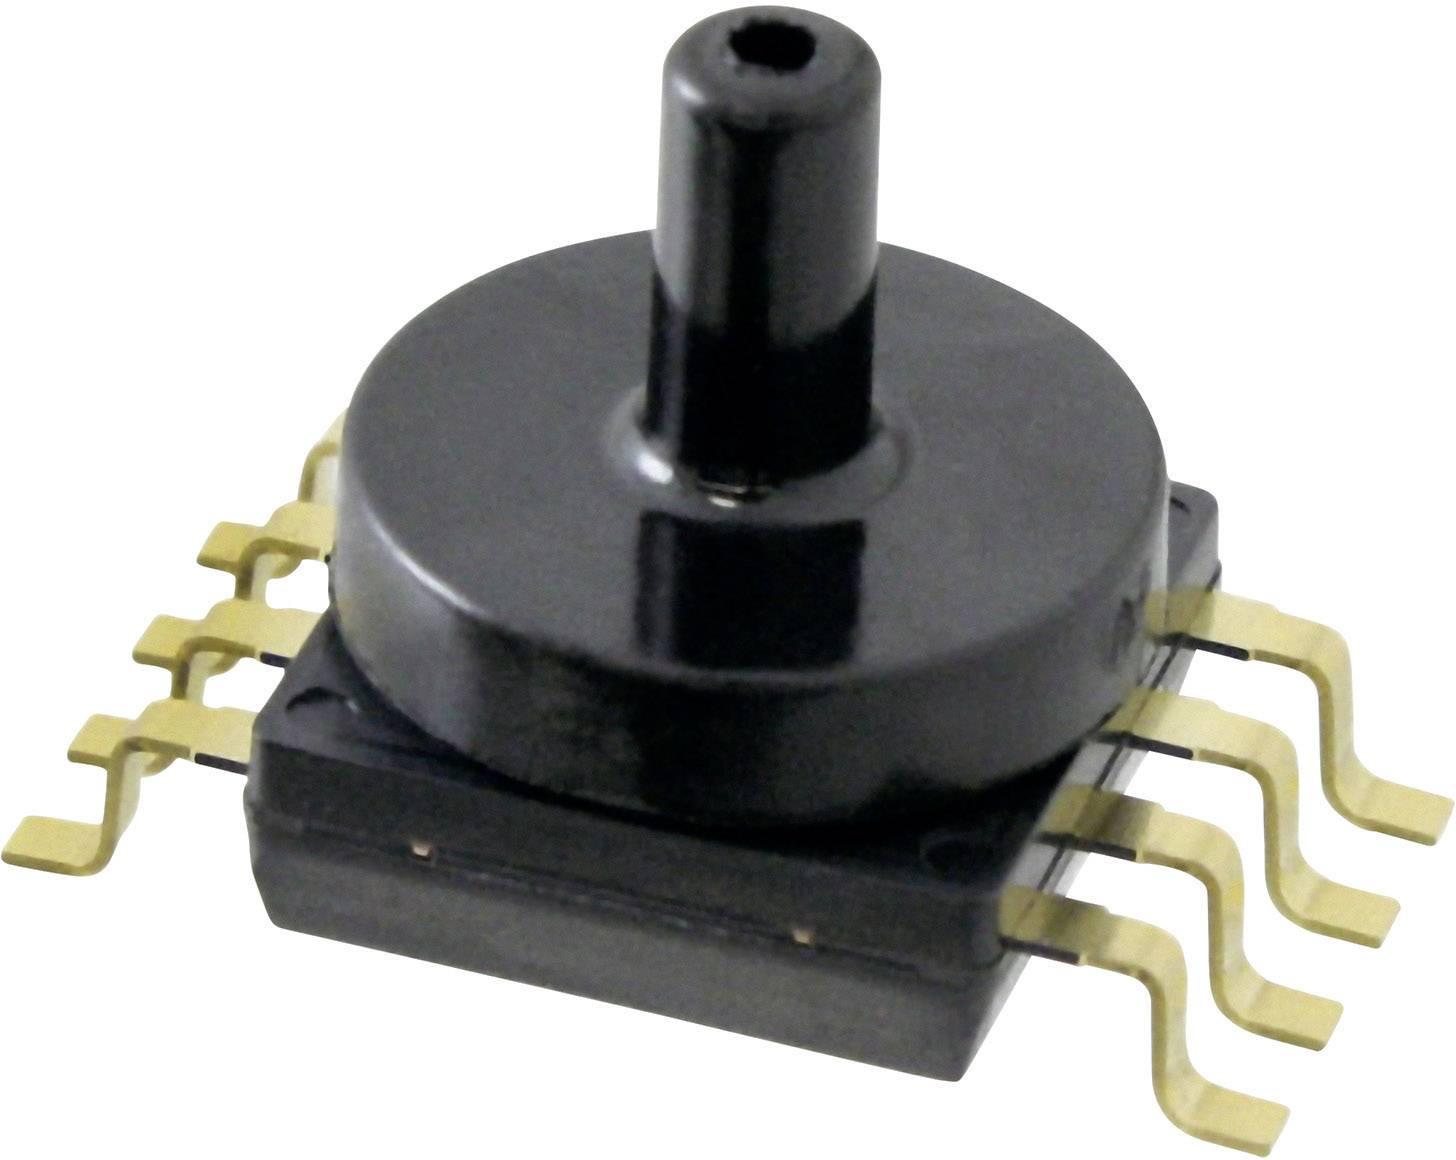 Senzor tlaku NXP Semiconductors MPXV7007GC6U, -7 kPa do 7 kPa